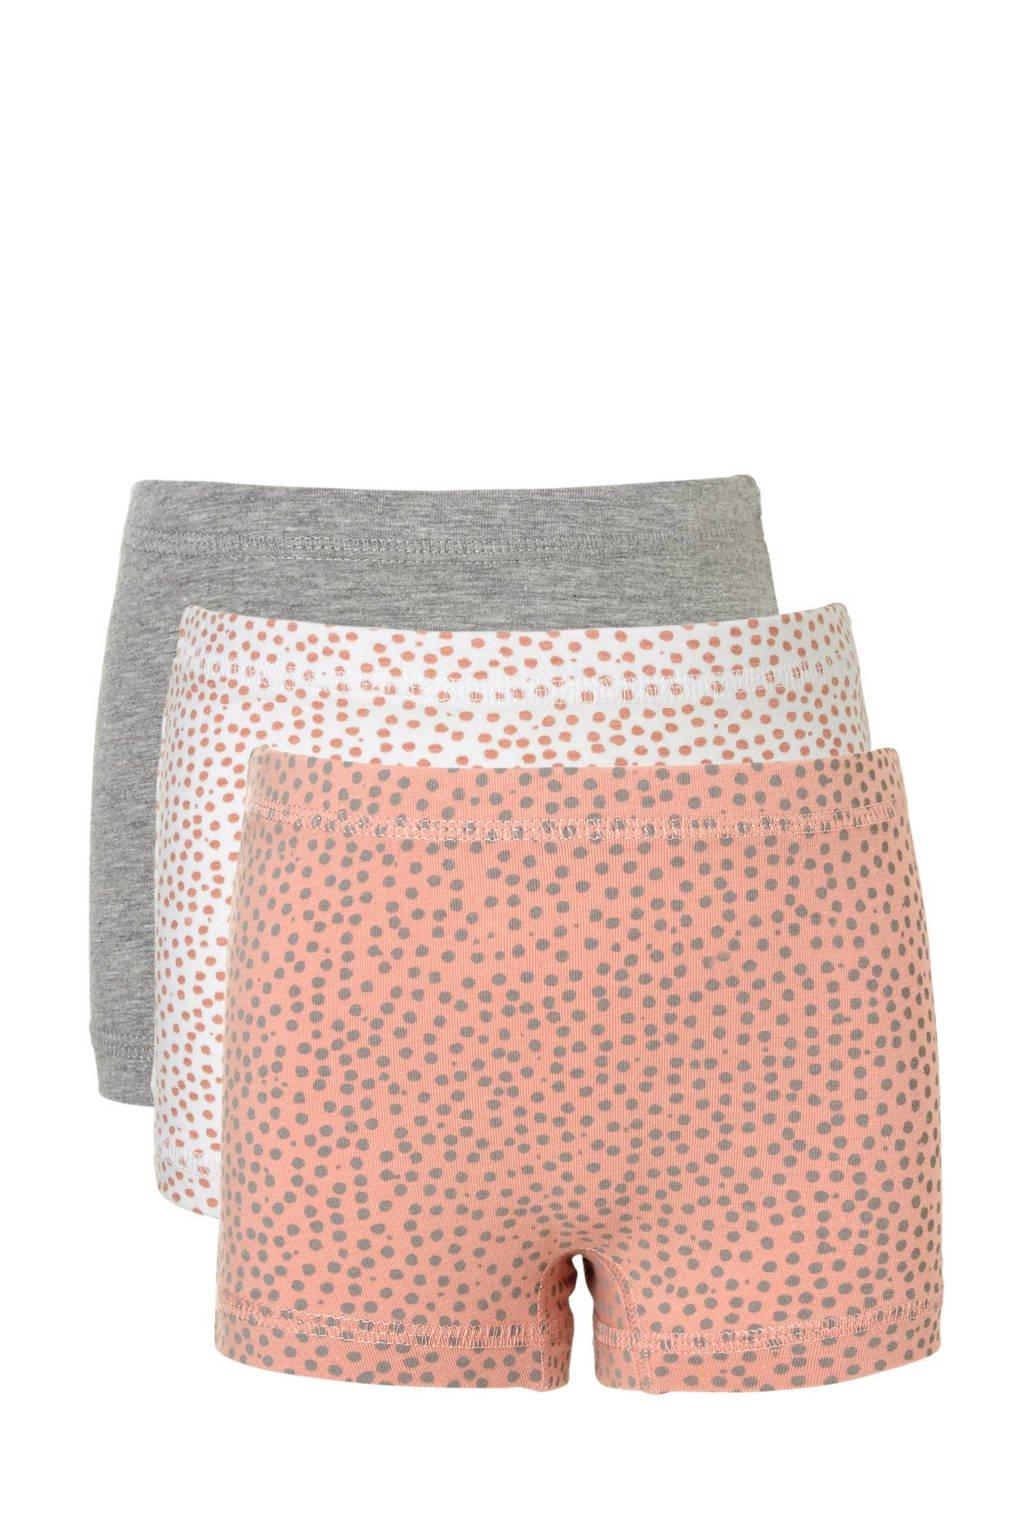 name it MINI short (set van 3), Roze/wit/grijs melange